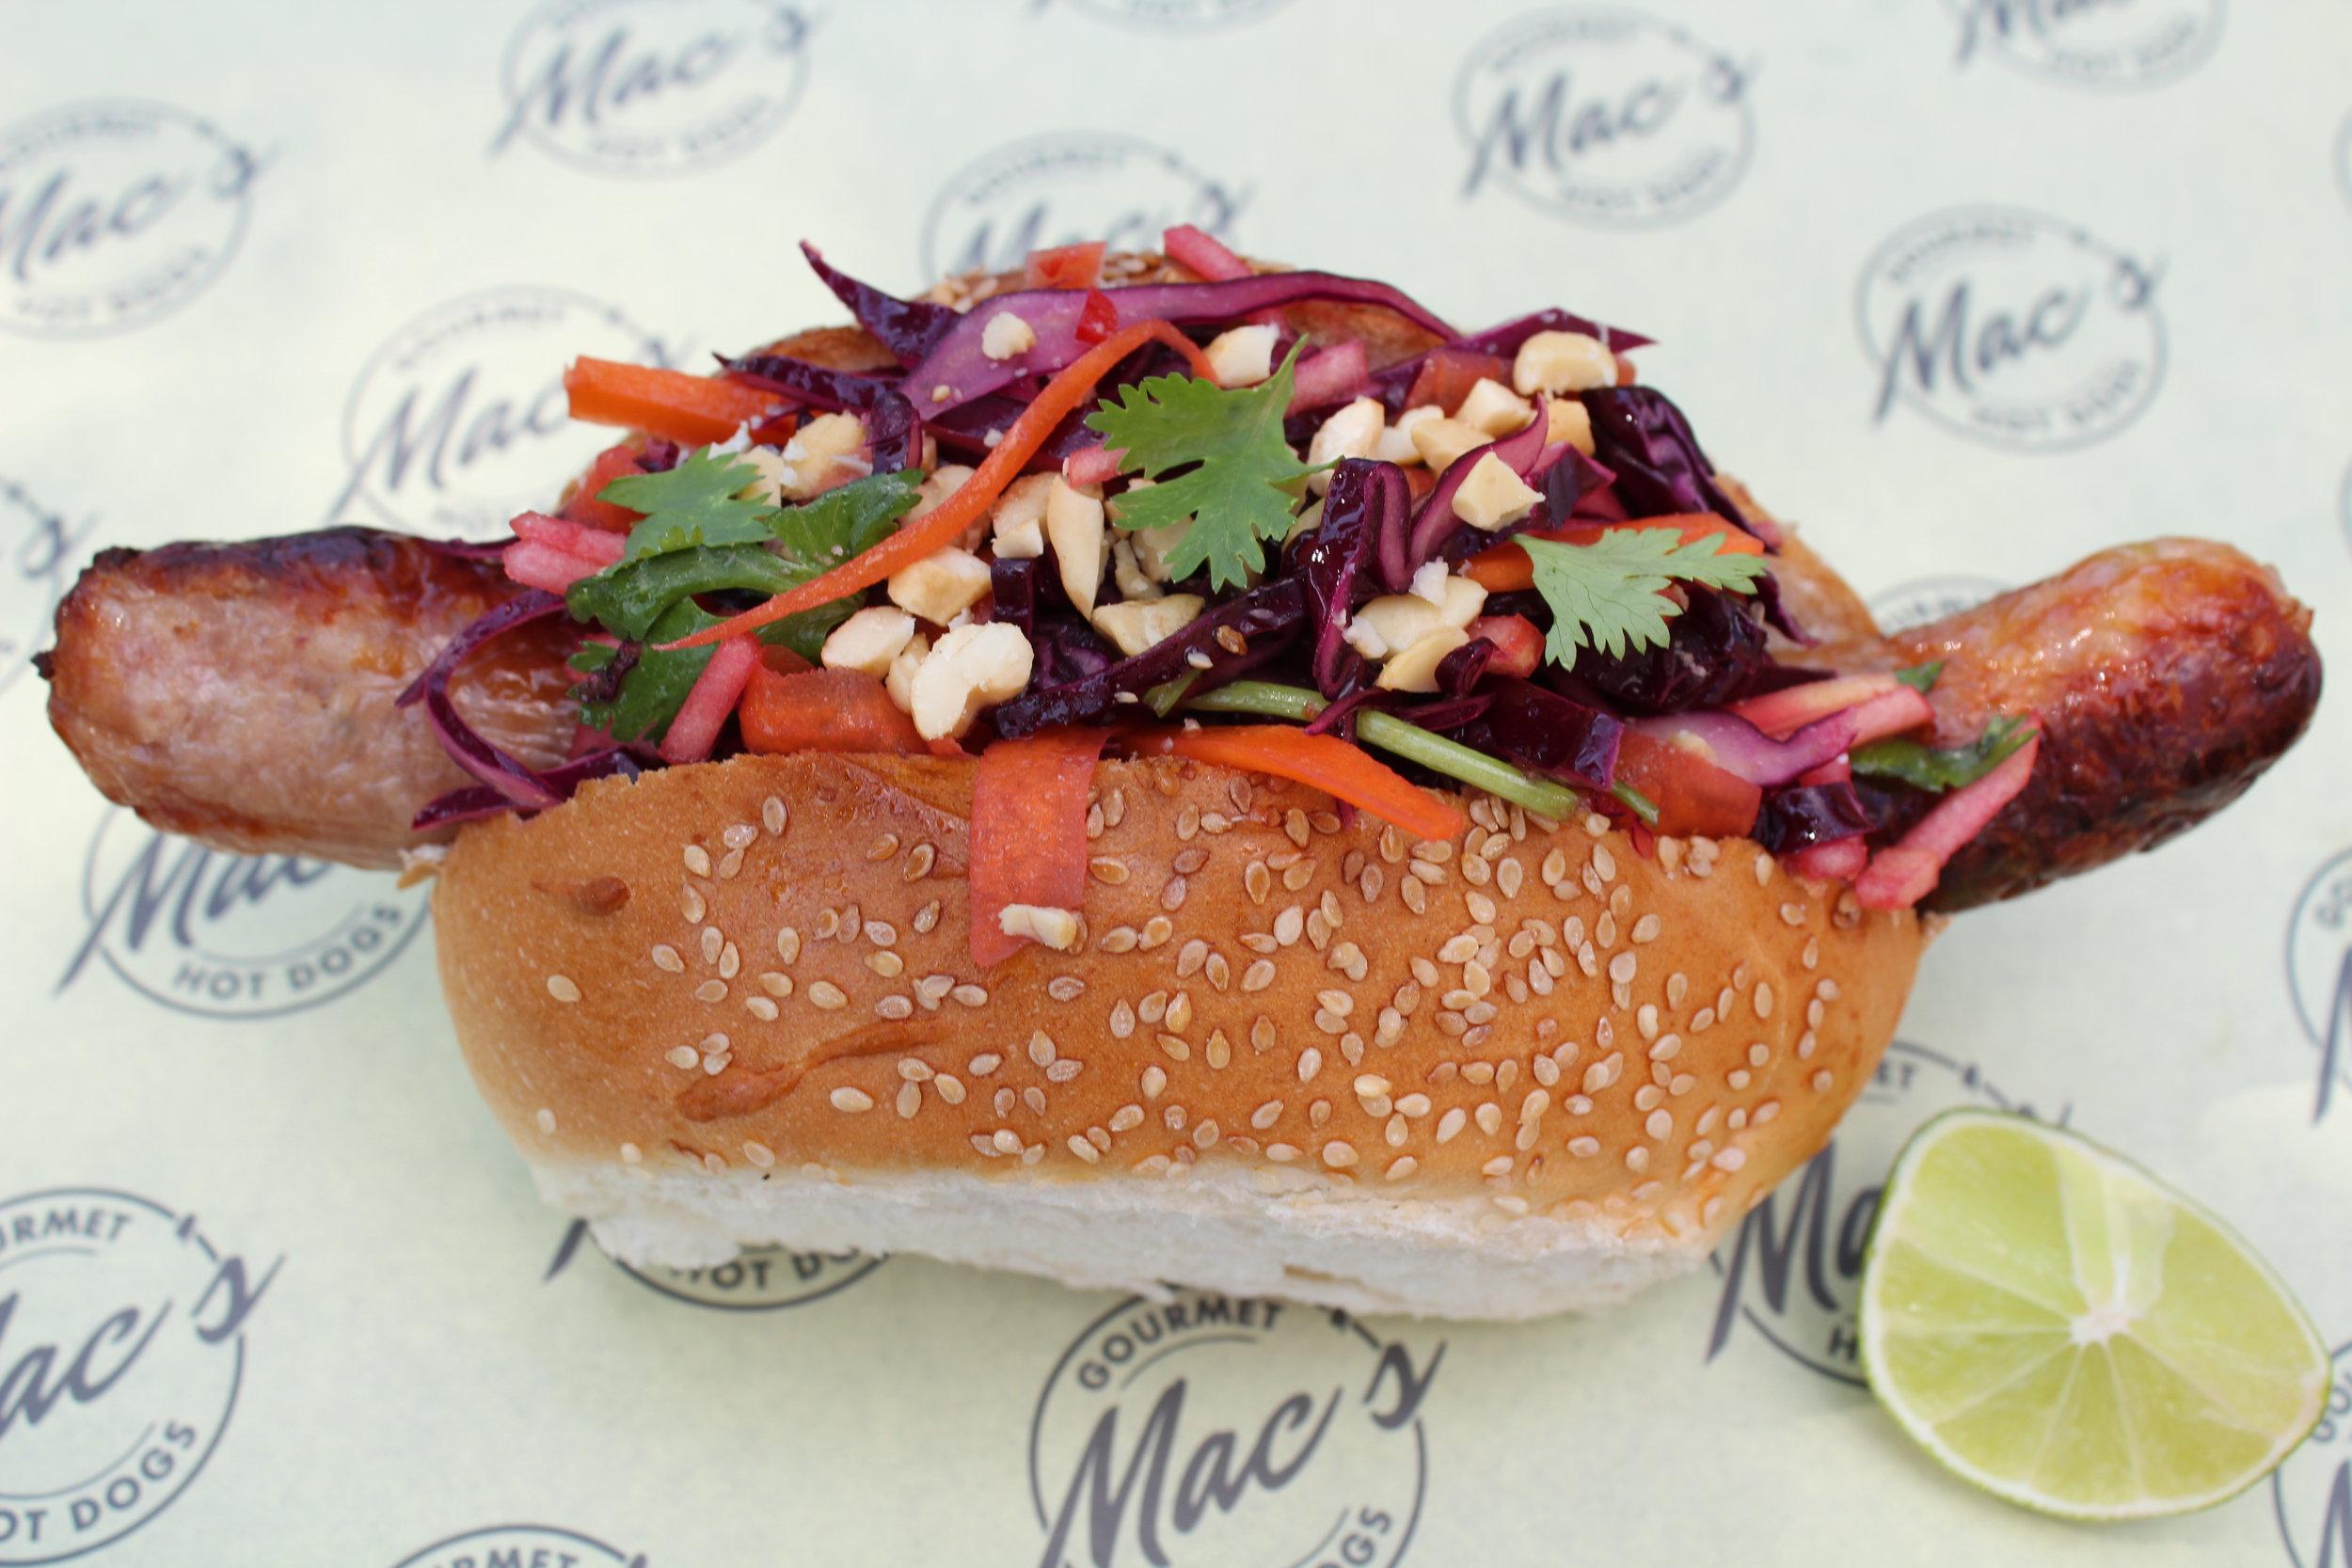 Asian Dog - Hot dog with Asian slaw